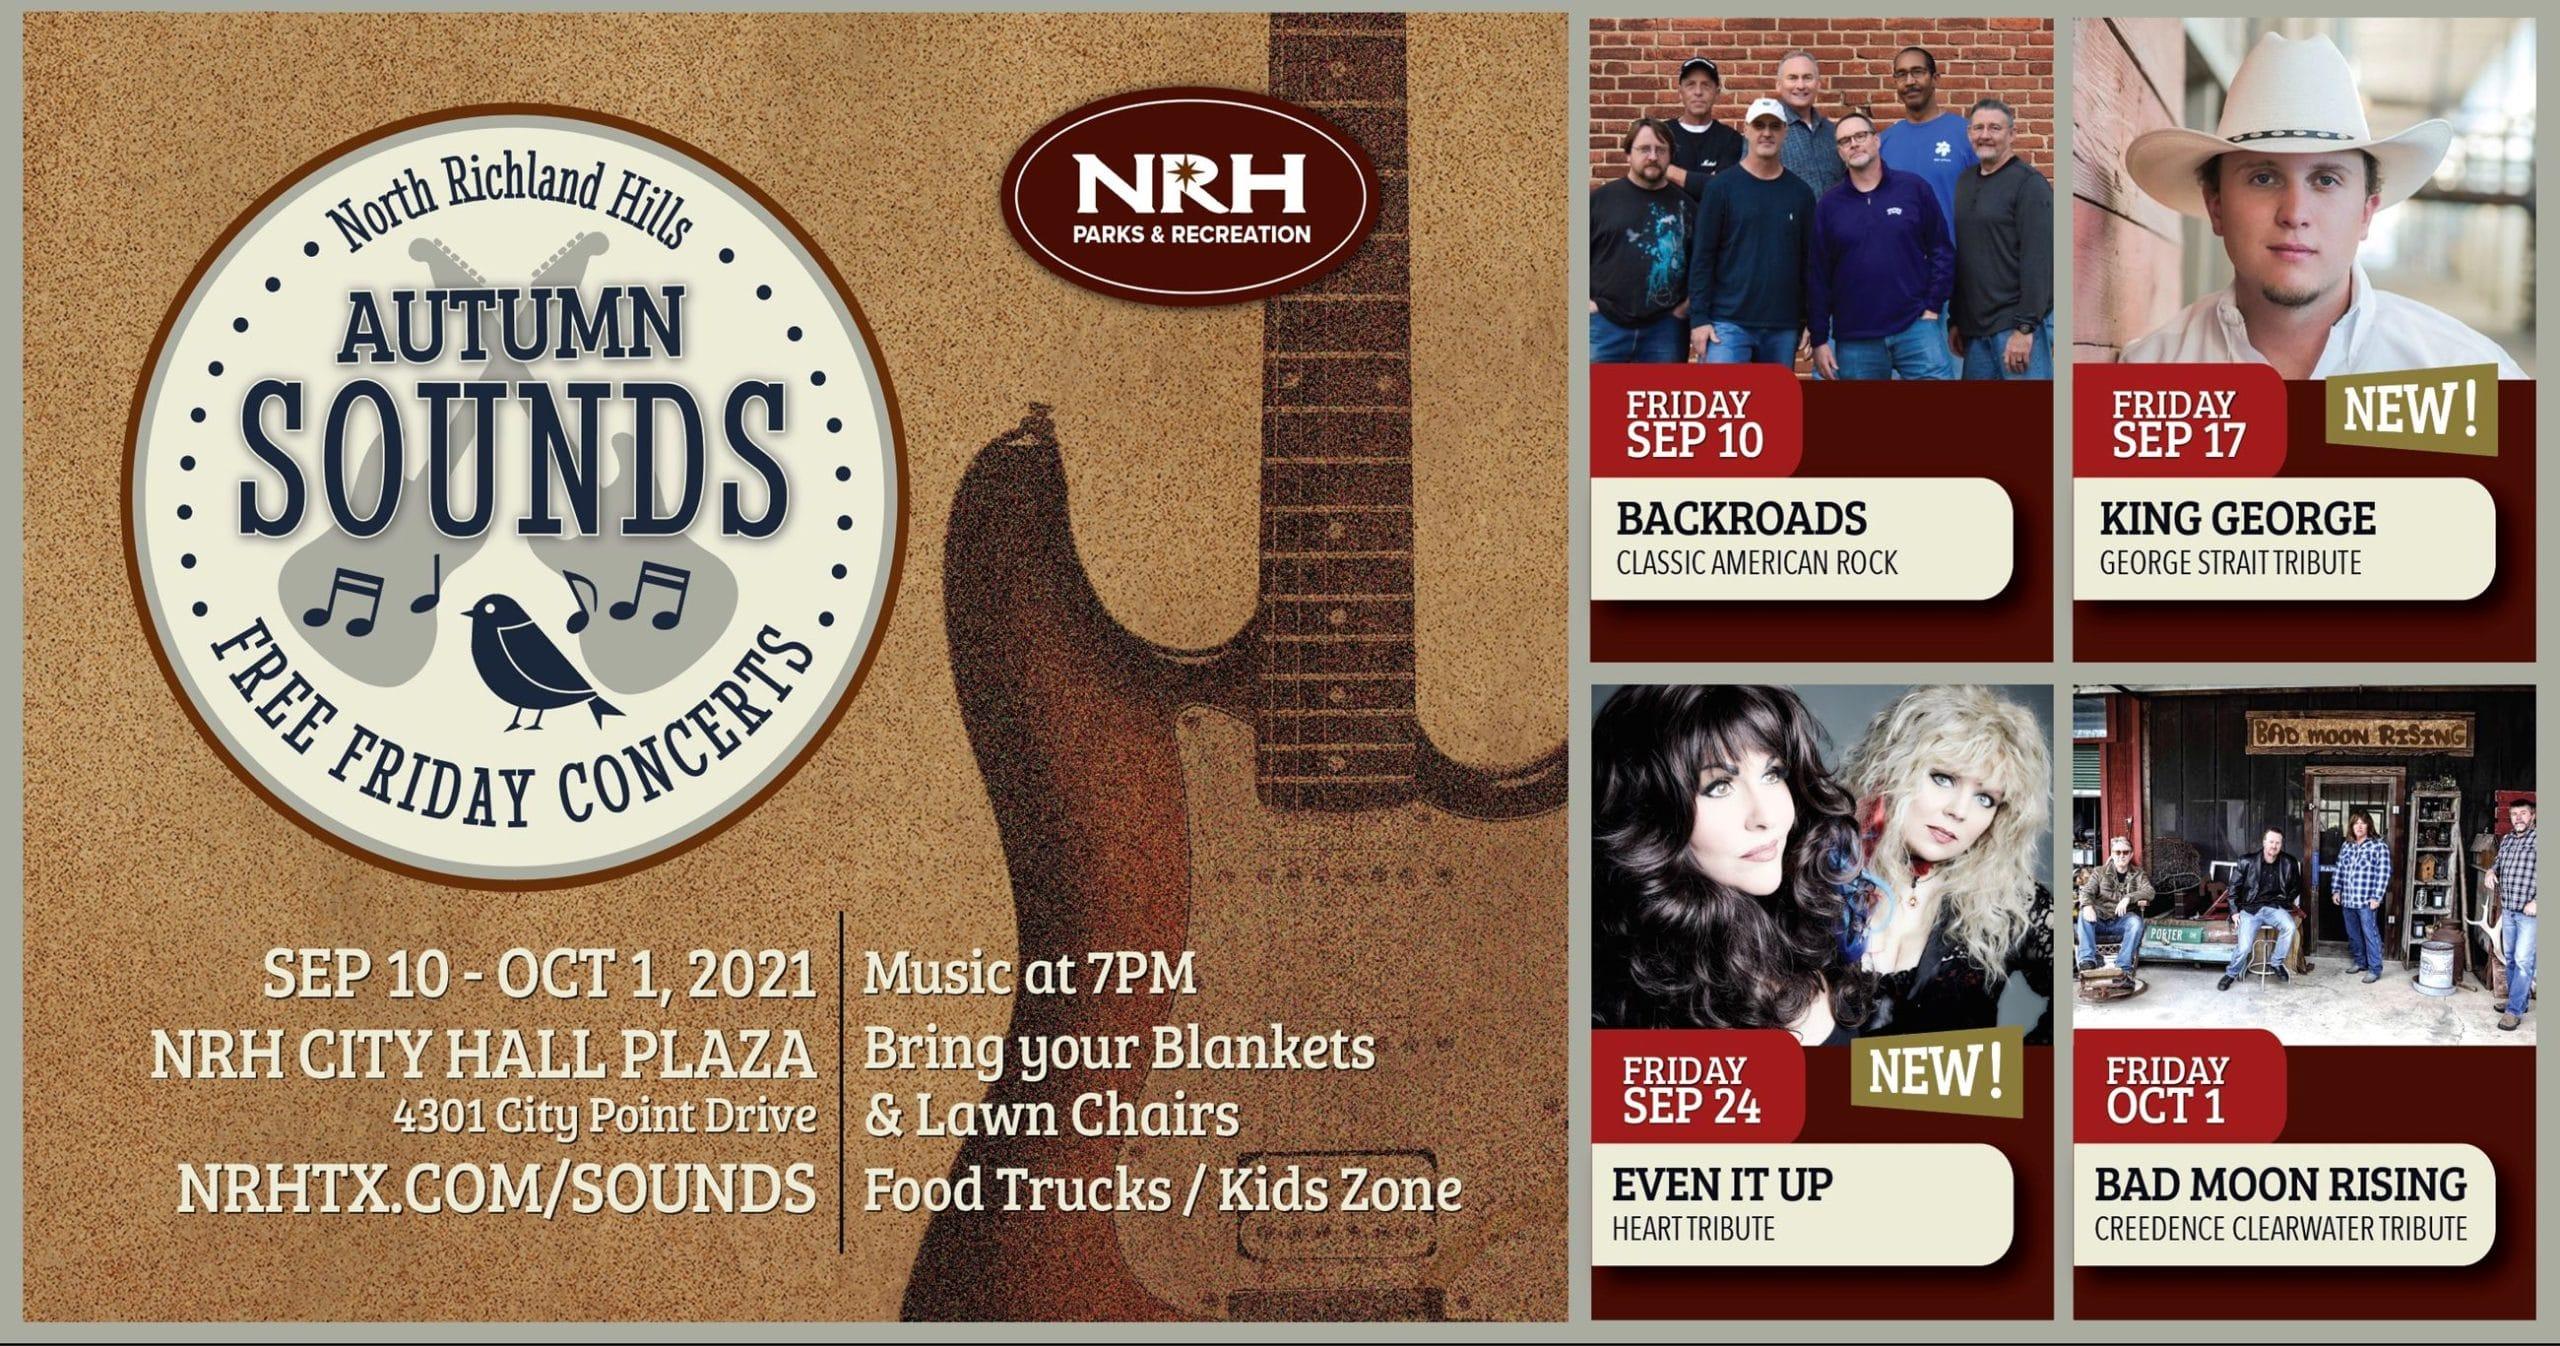 NRH Autumn Sounds Concert Series